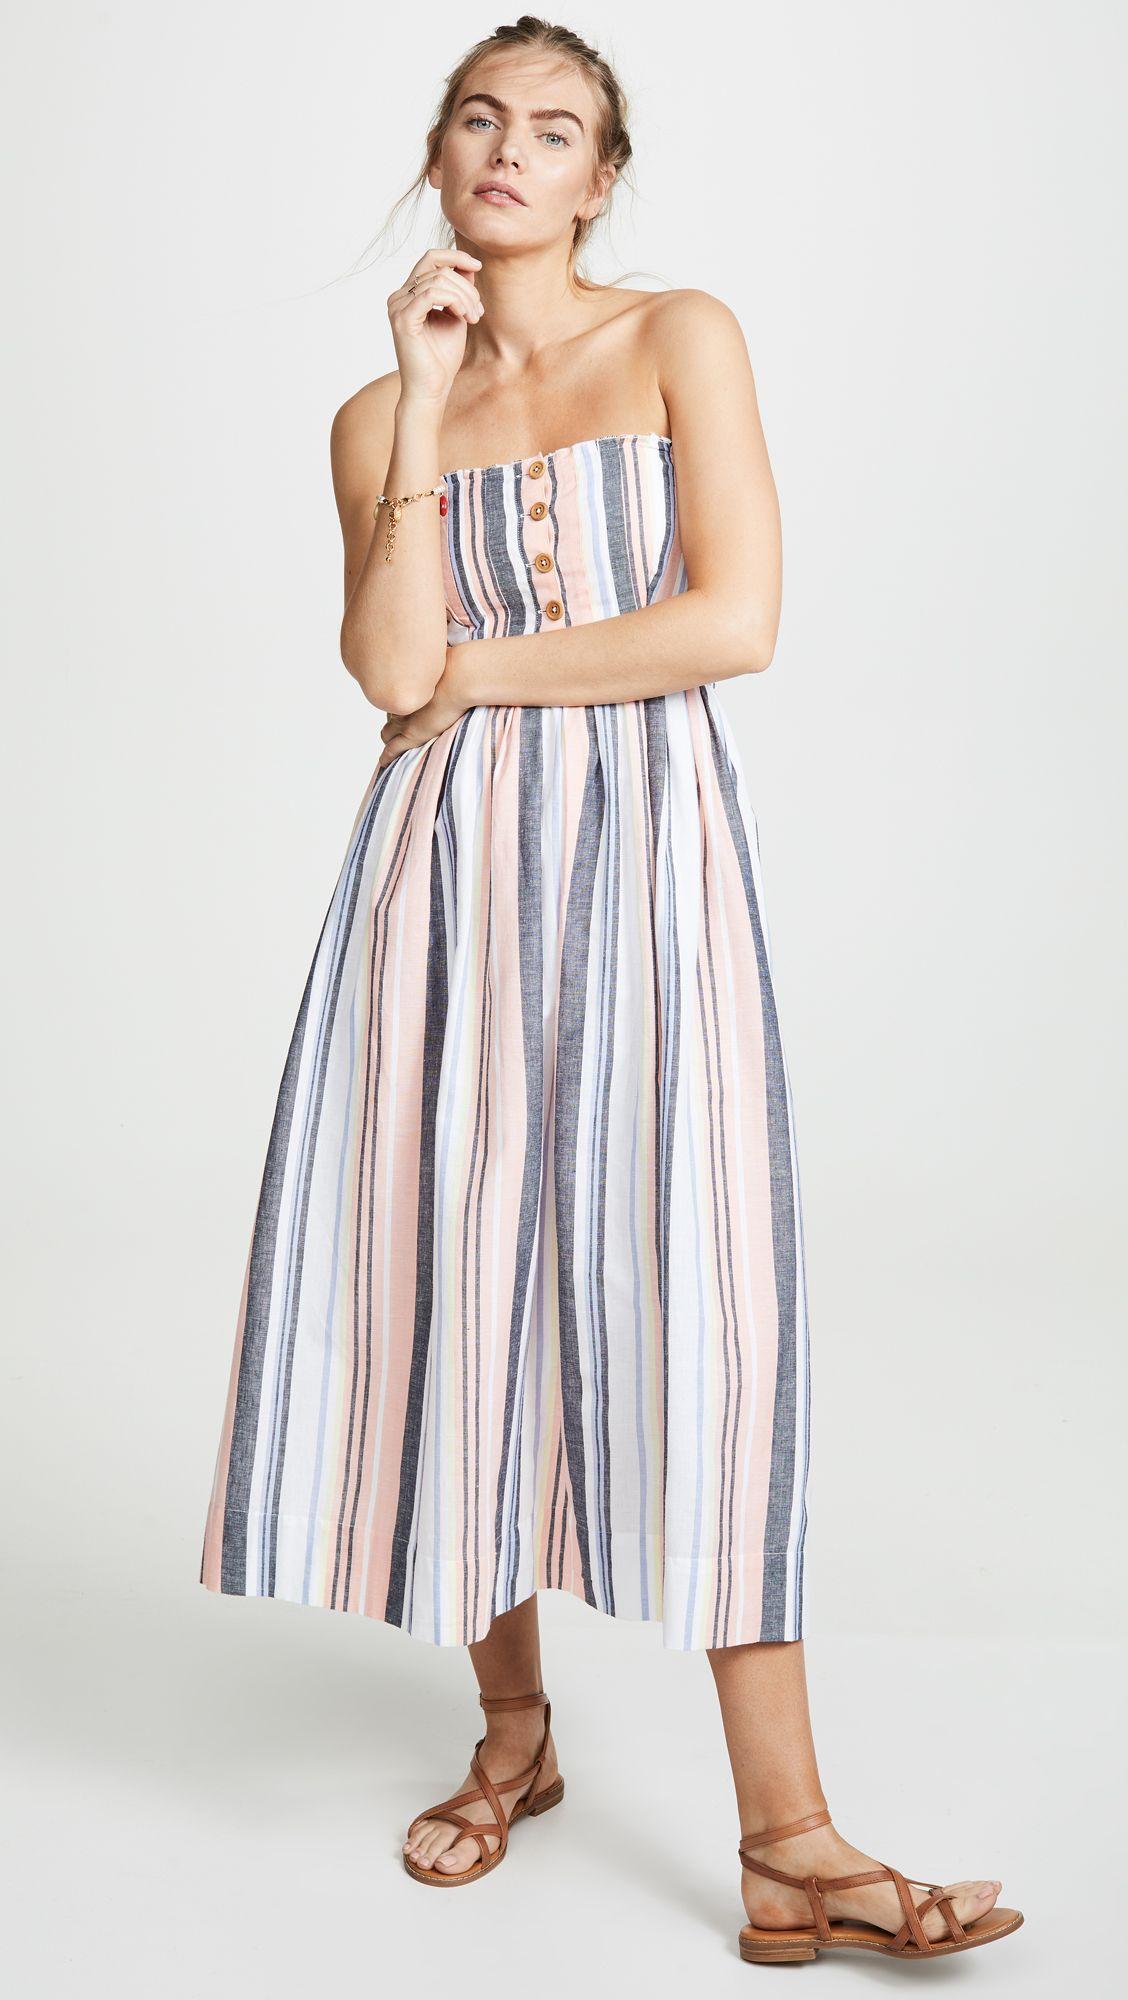 Free People Lilah Pleated Tube Dress Tube Dress Dresses Simple Summer Dresses [ 2000 x 1128 Pixel ]